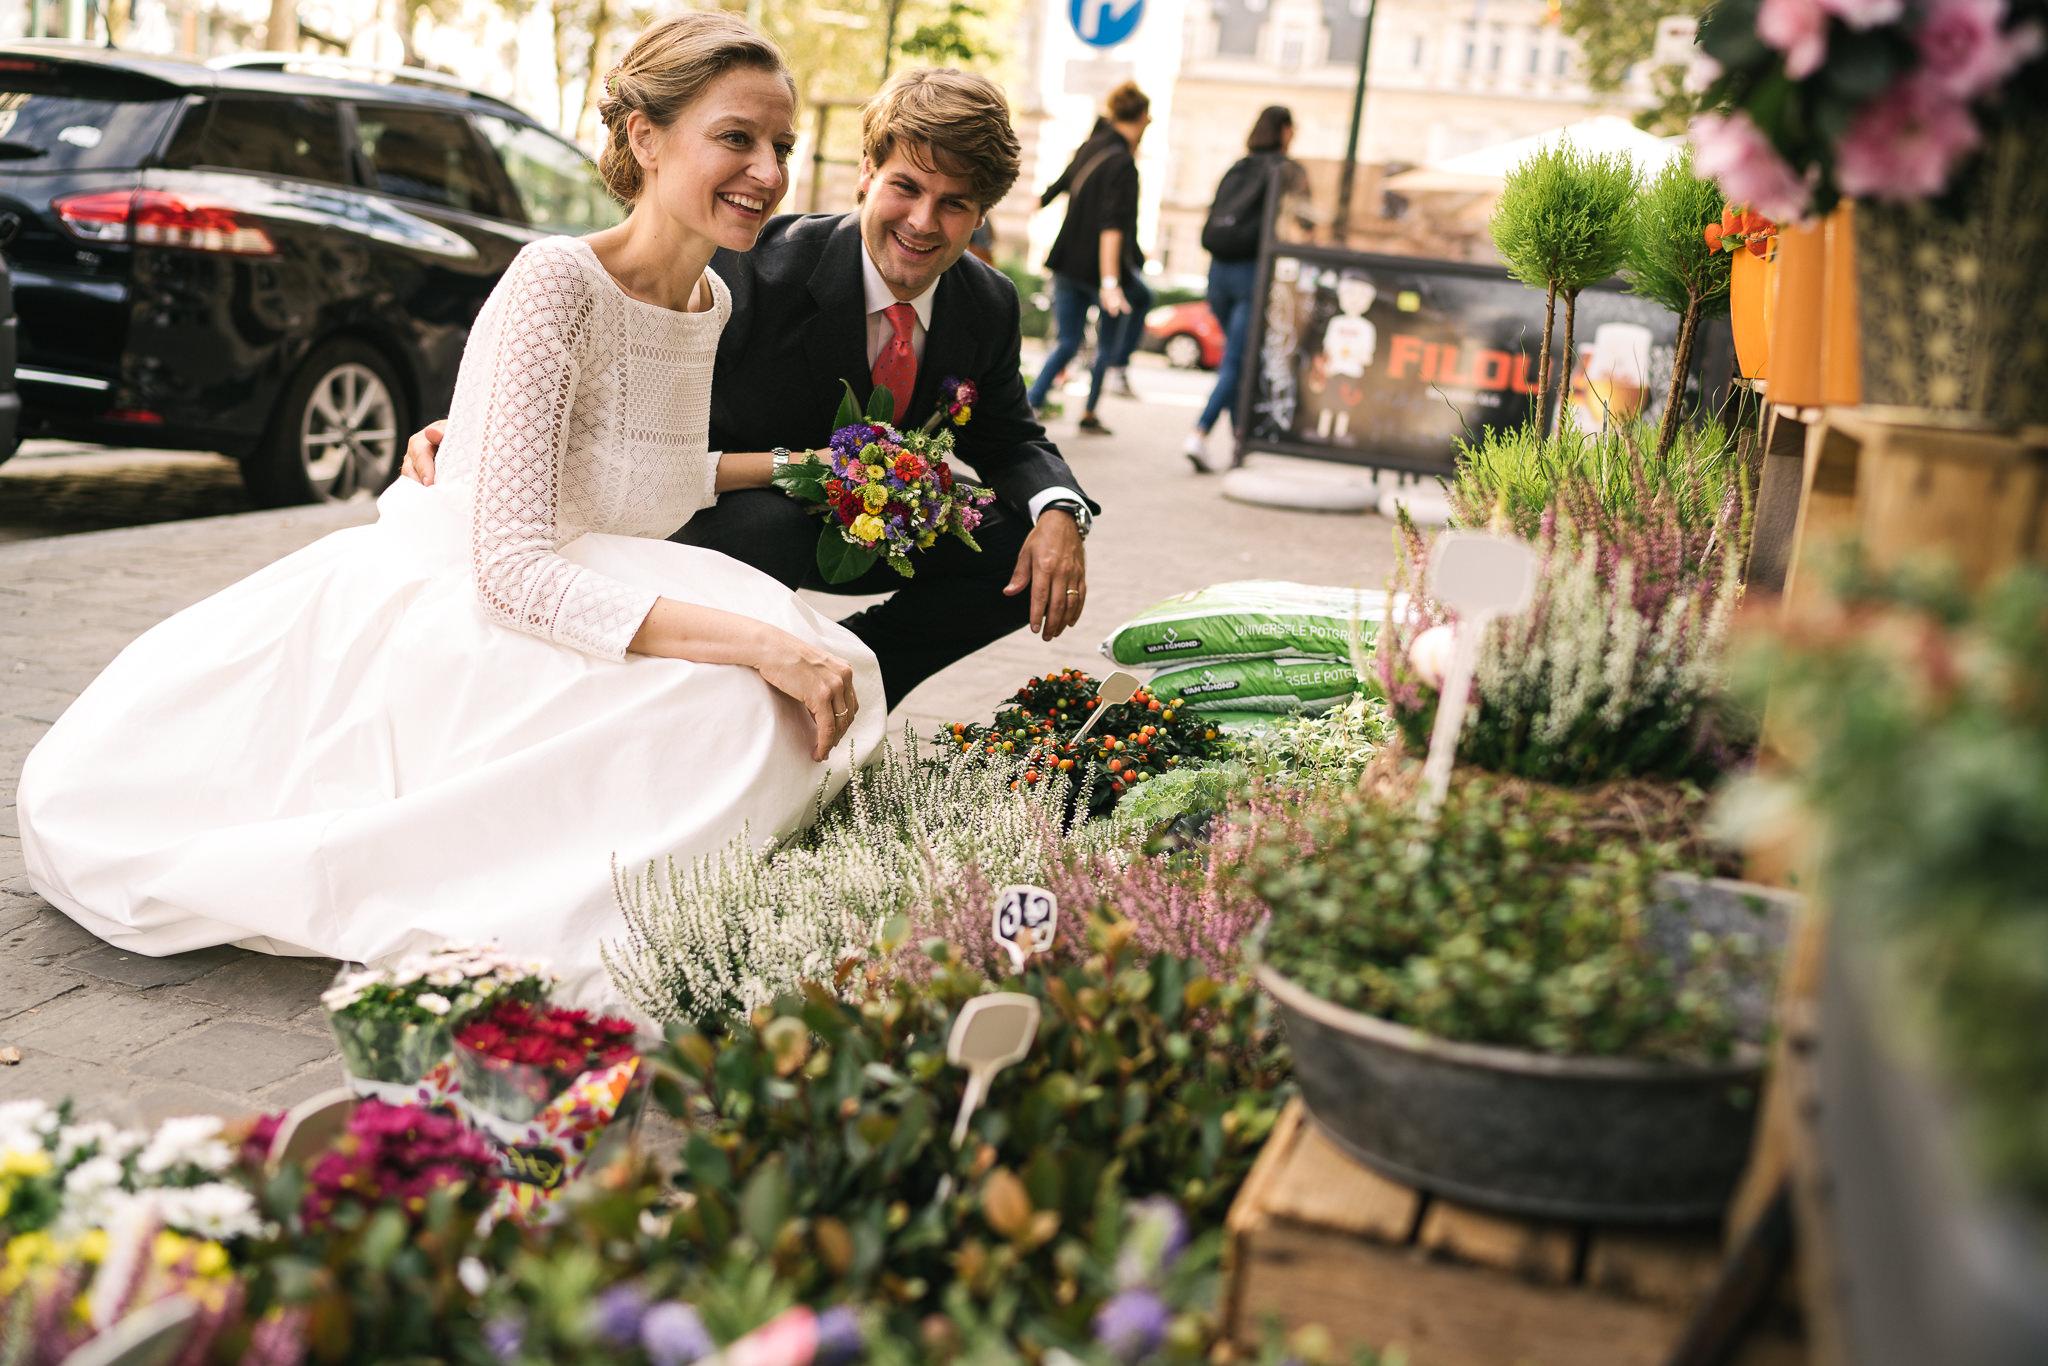 Wedding-Claudia&Philipp-15092018-small-141.jpg